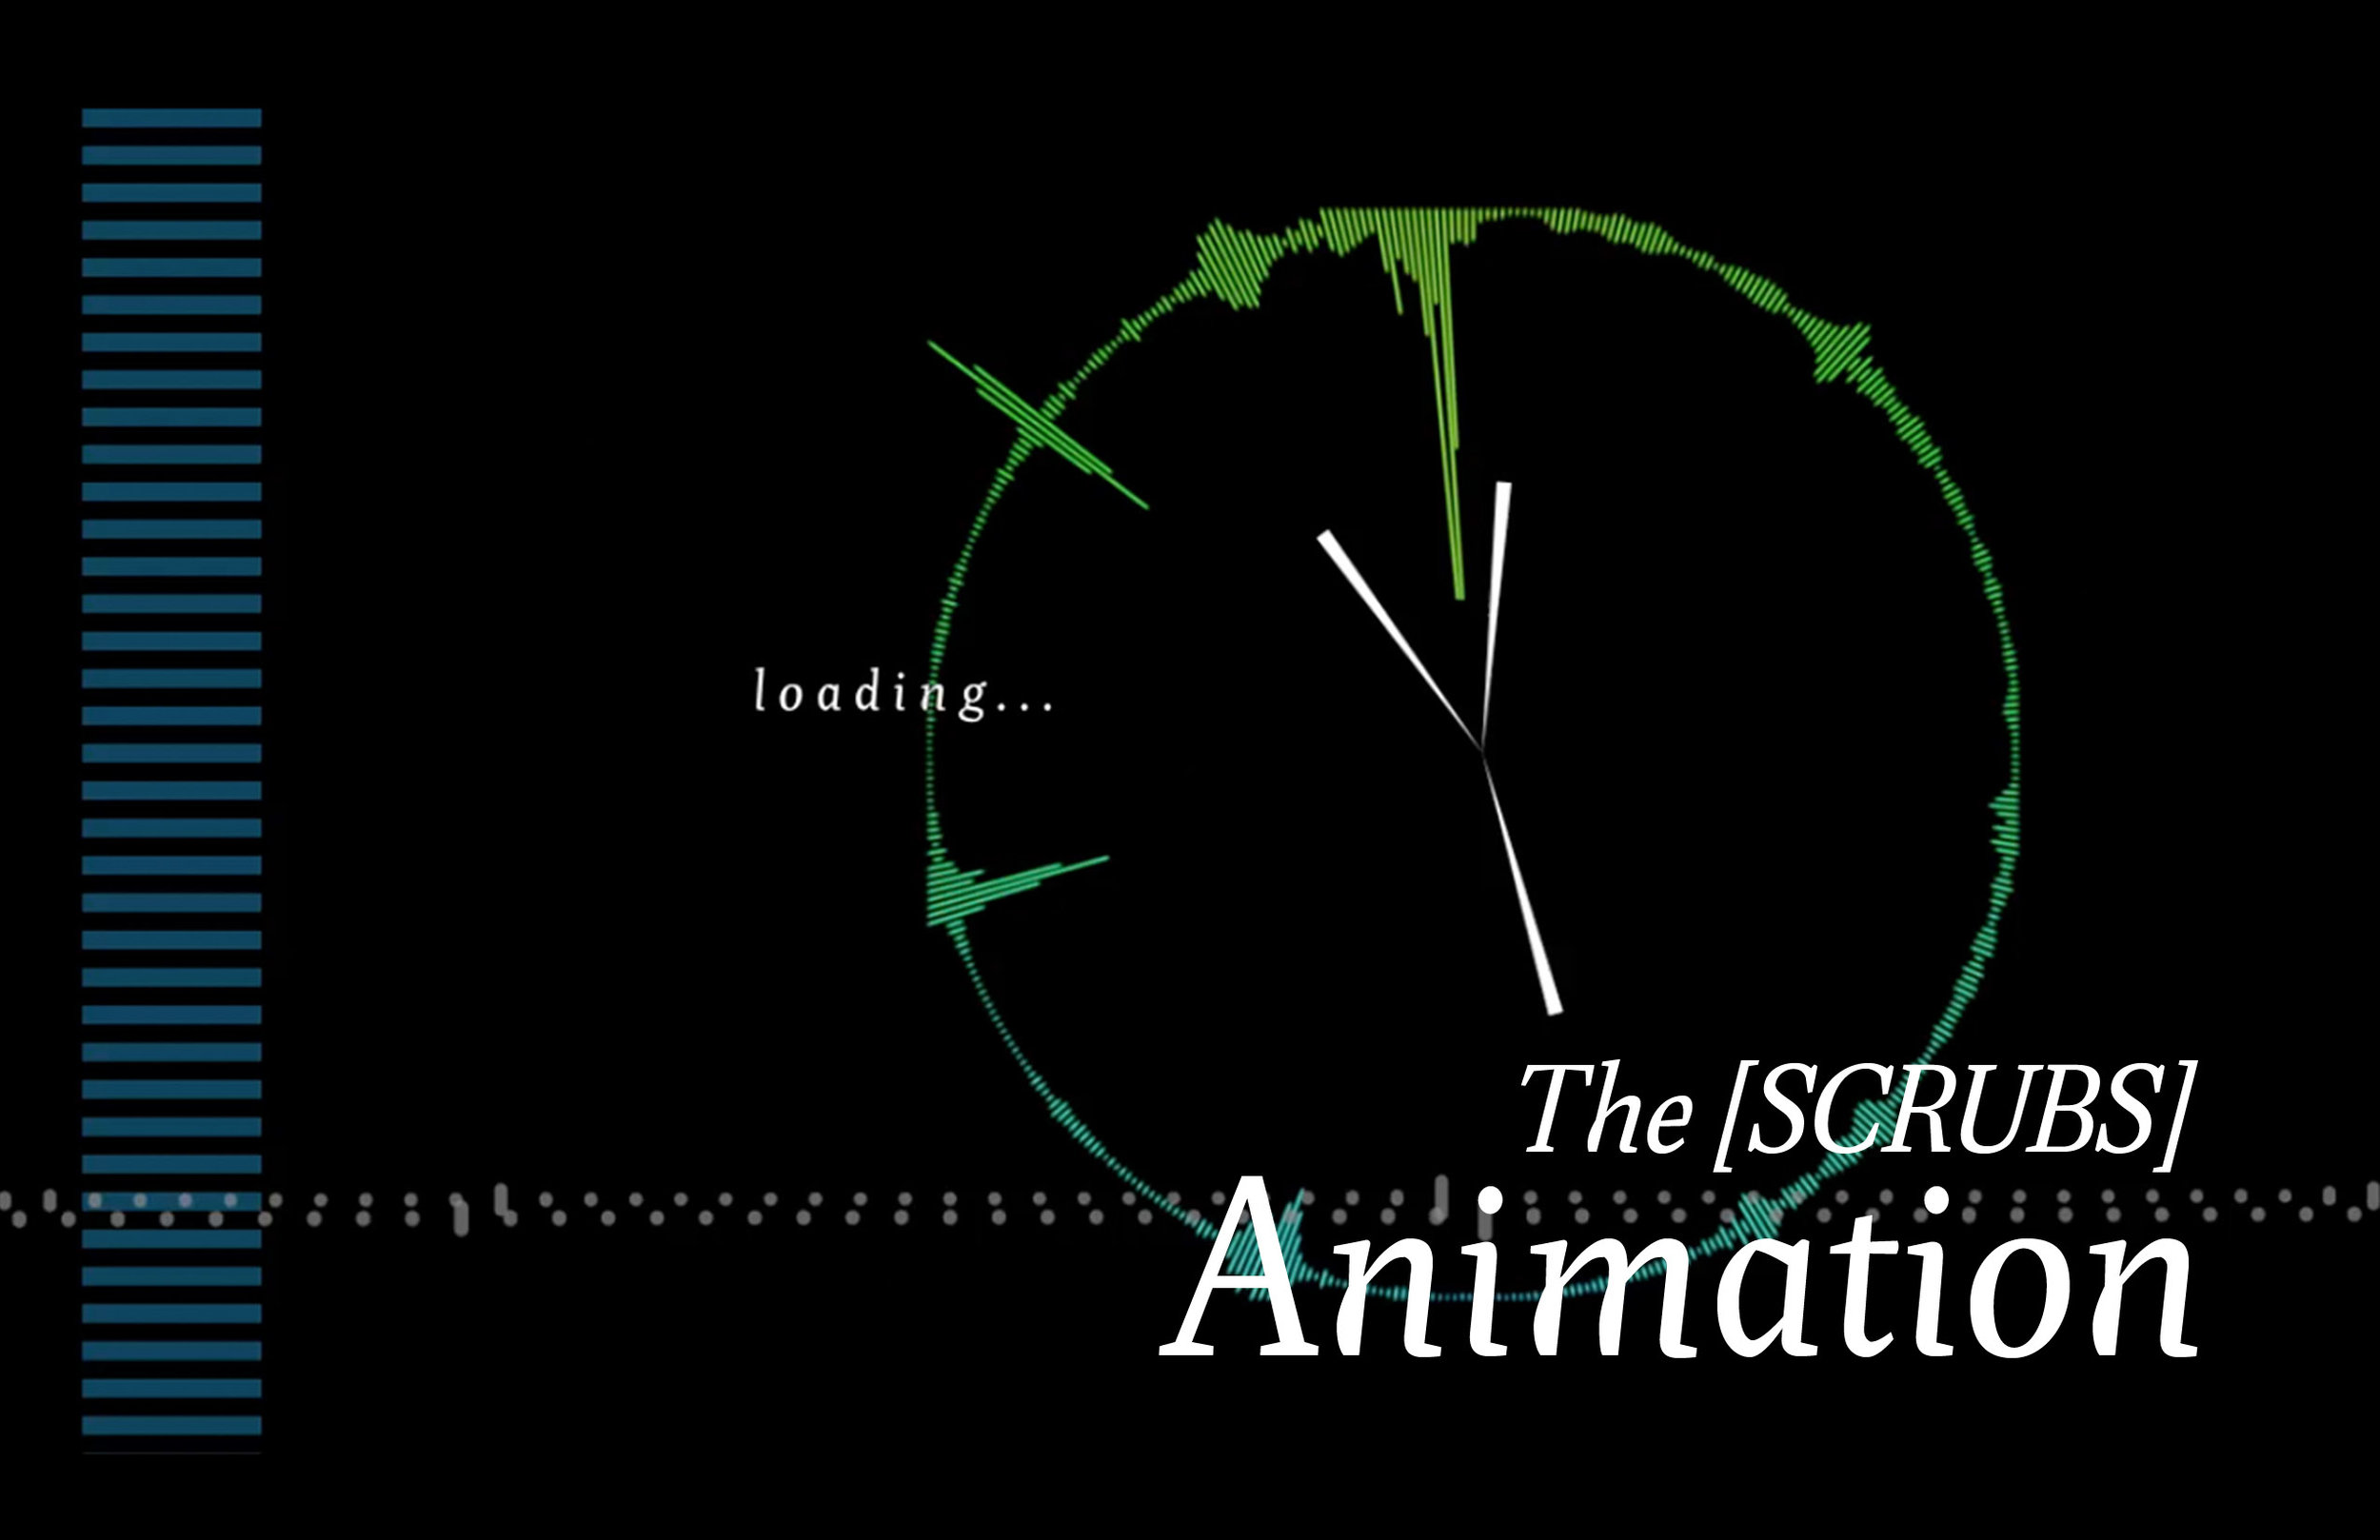 loading SCRUBS animation R.jpg